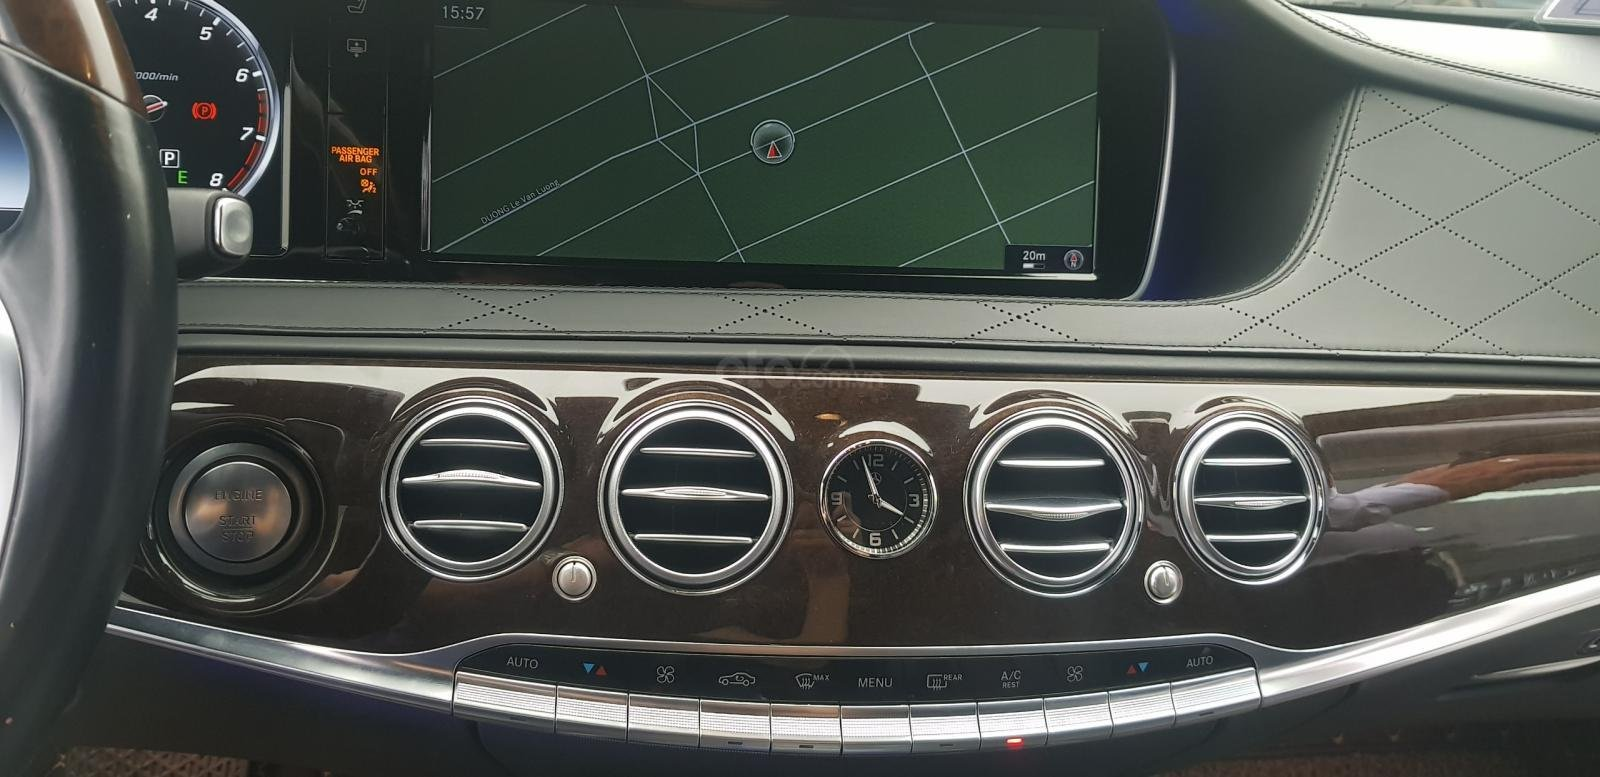 Bán Mercedes-Benz S500 SX 2016 màu đen, LH Ms  Hương 094.539.2468 (7)